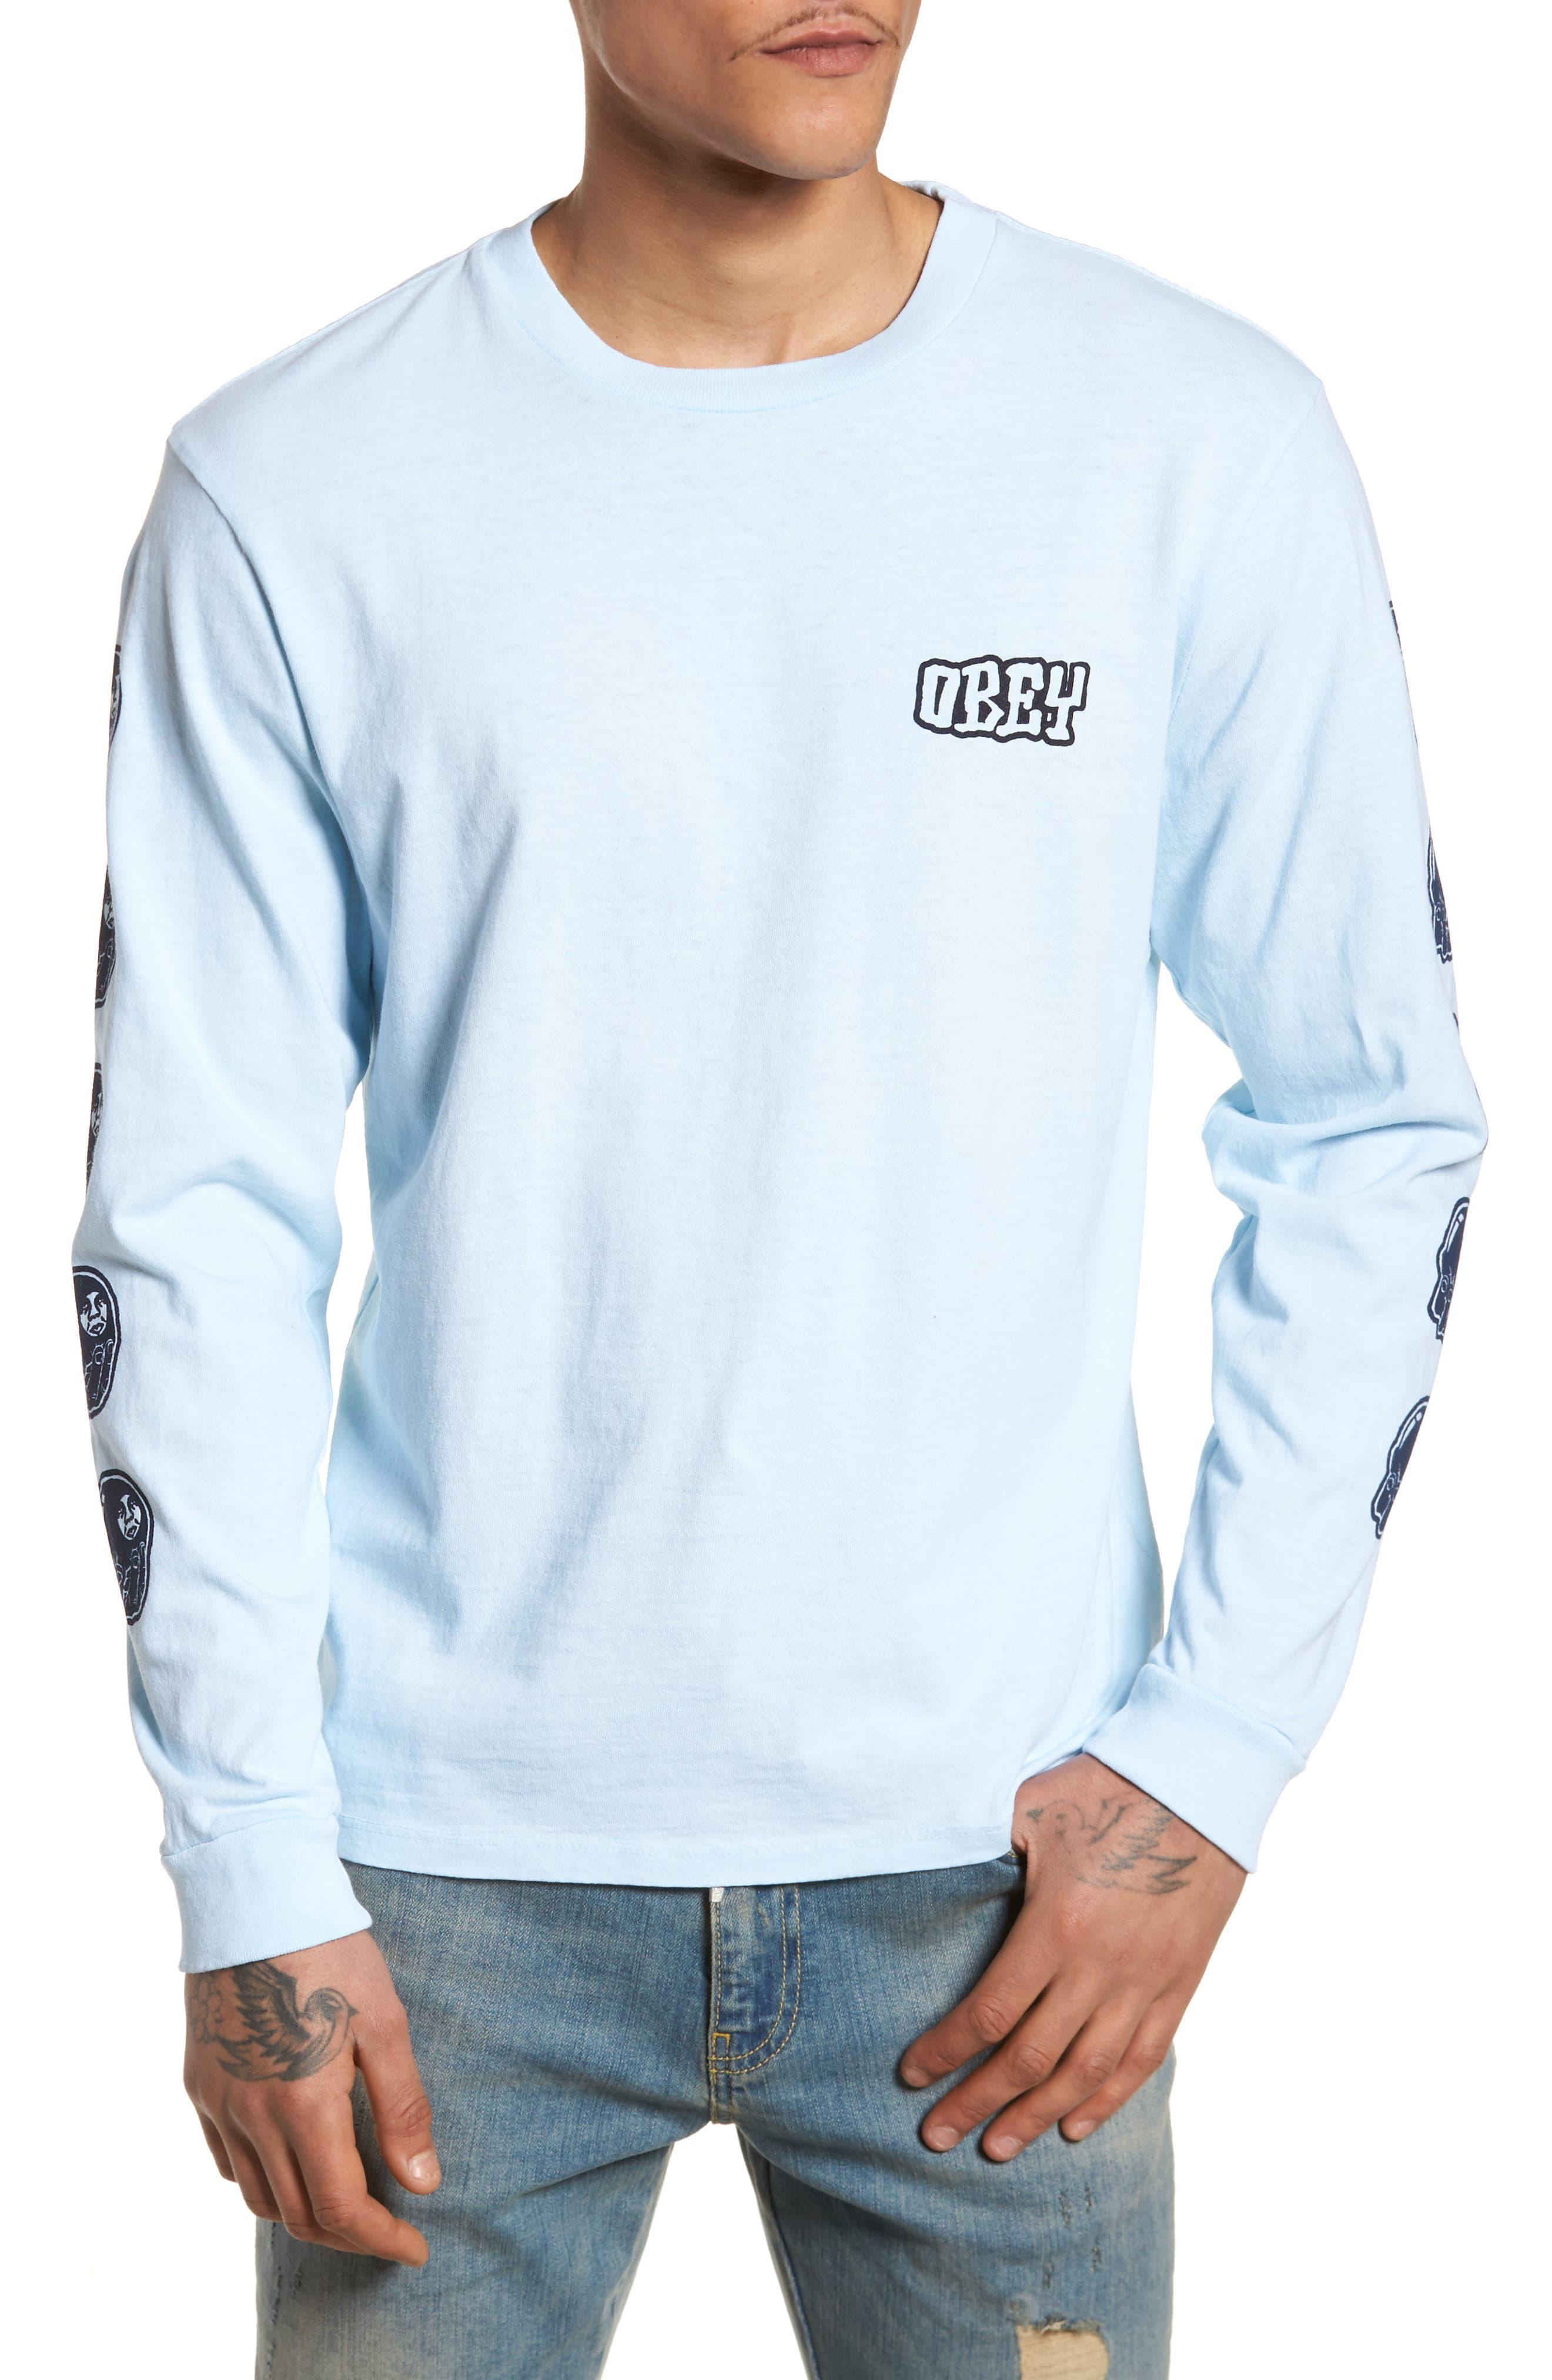 Unwritten Future Graphic T-Shirt,                         Main,                         color, Dusty Blue